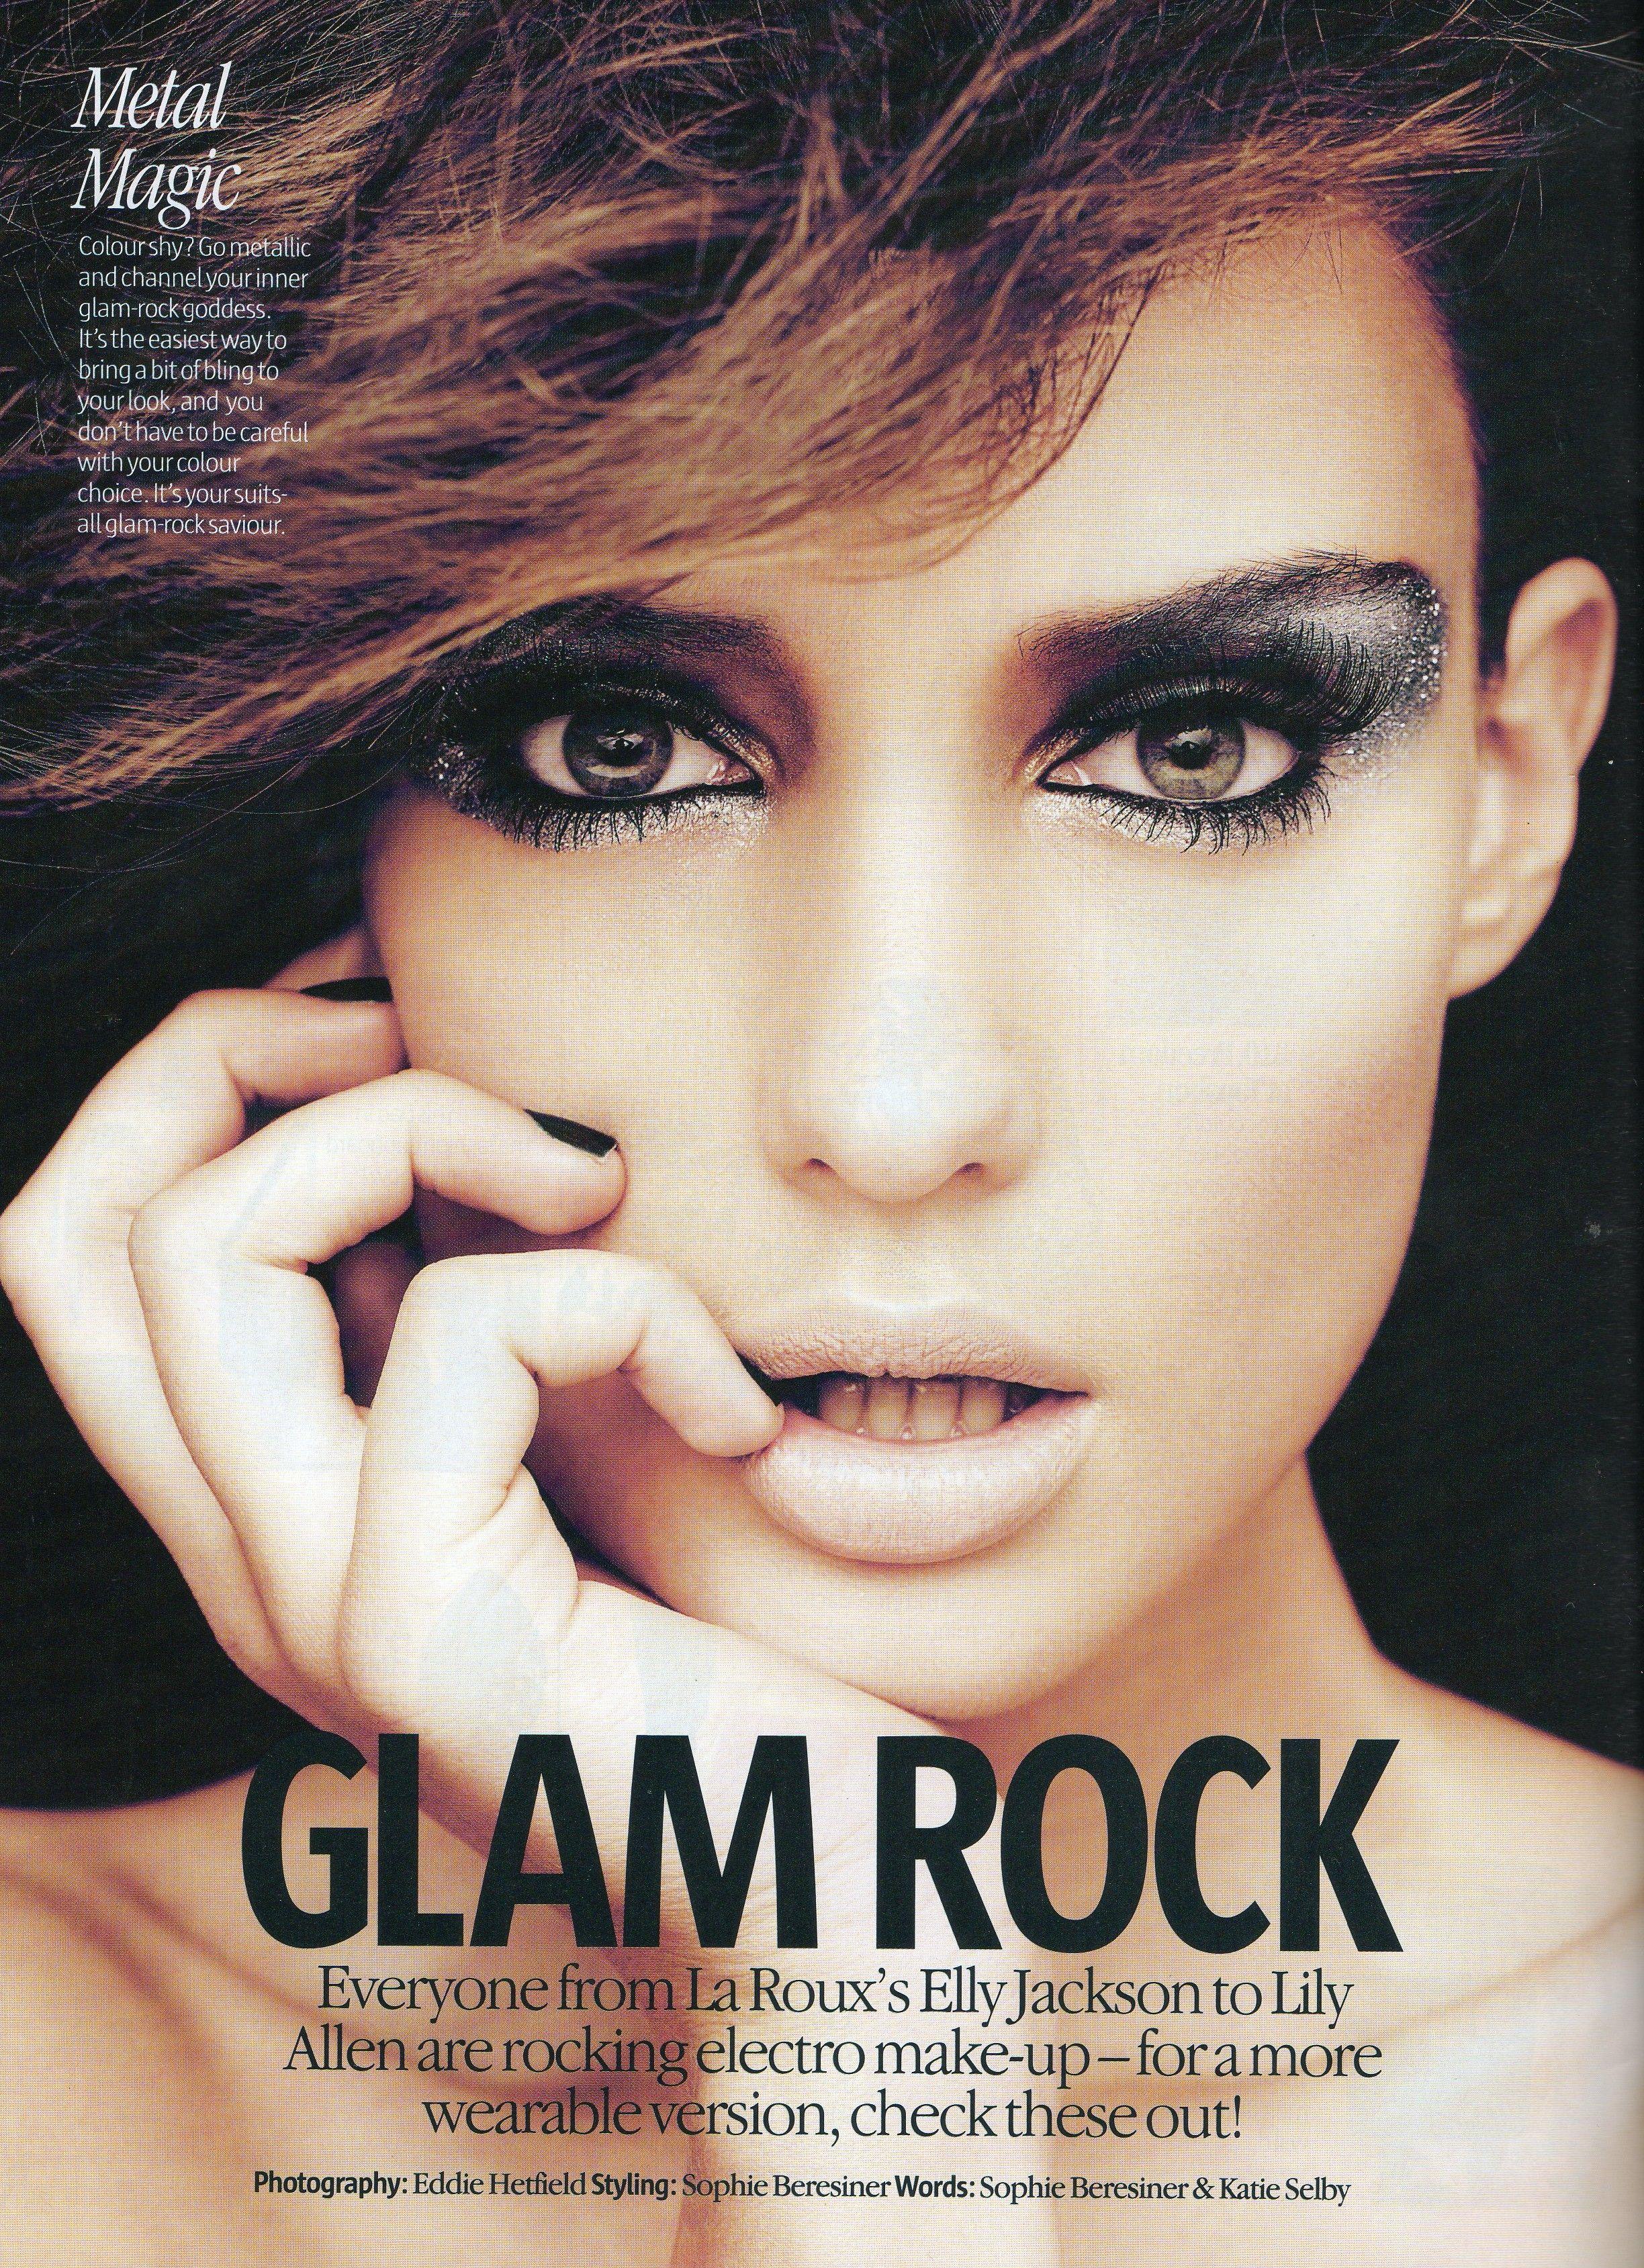 CELEBRITY SKIN - Hard Rock / A.O.R. / Glam Webzine